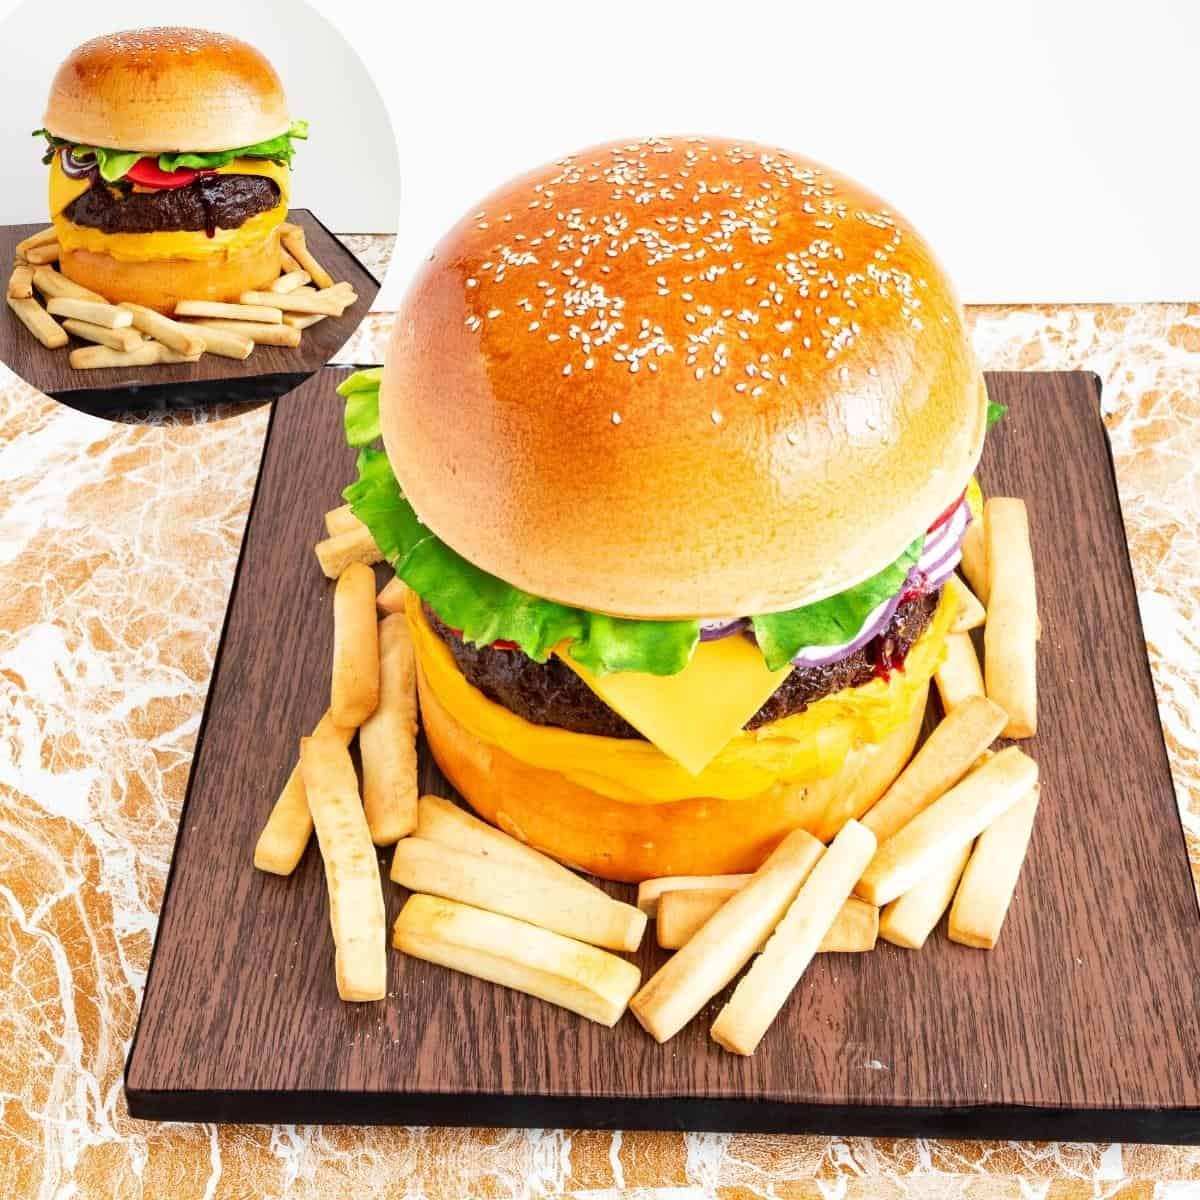 A cake shaped like a burger with fries on a cake board.